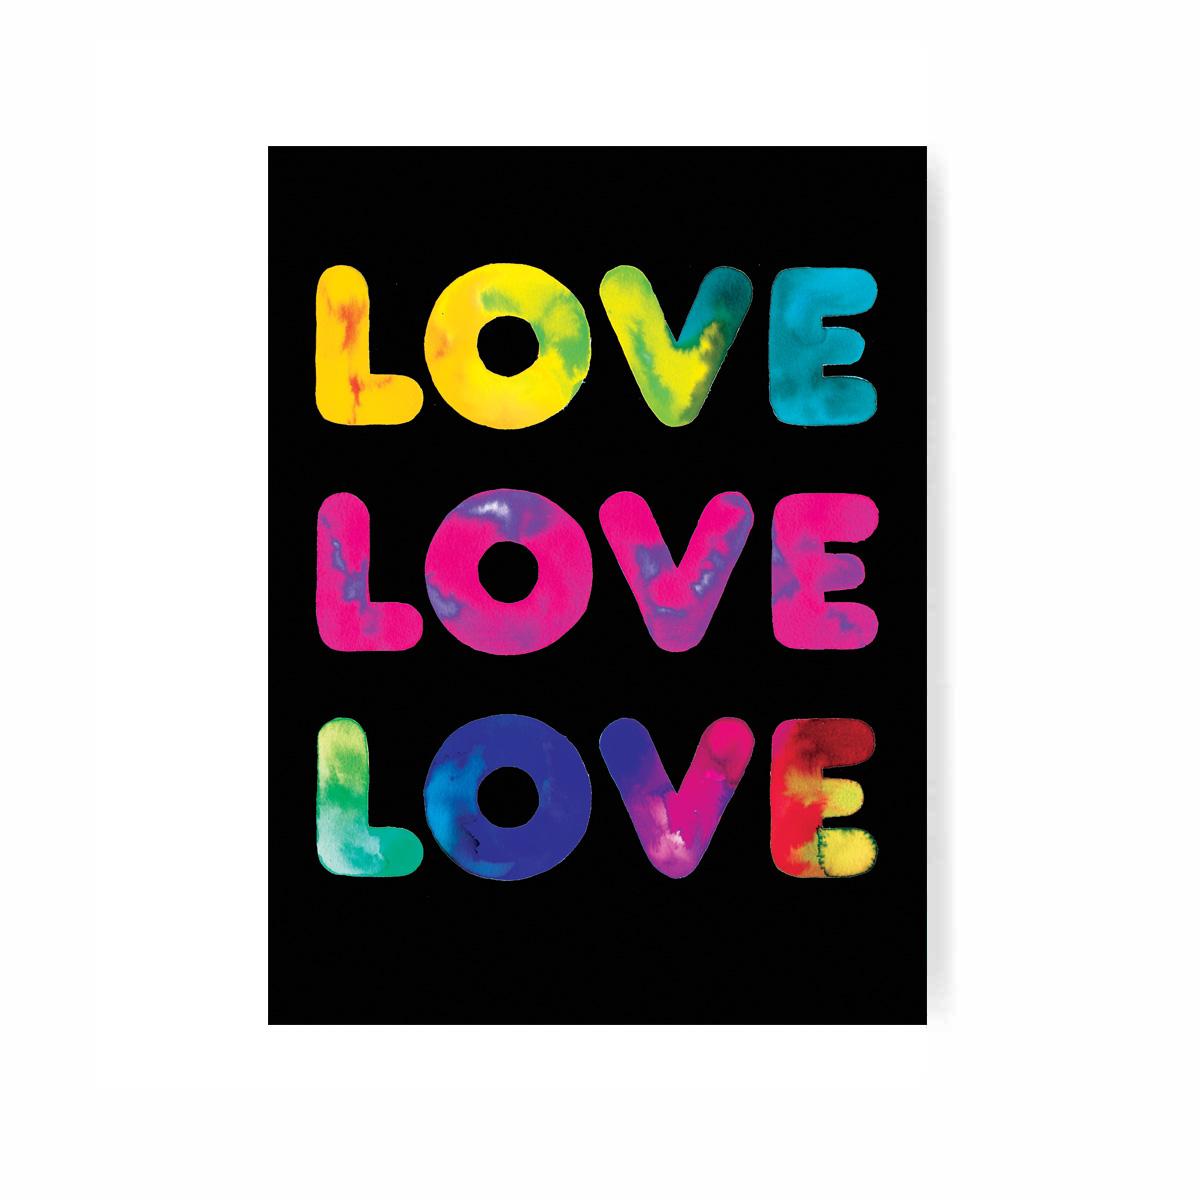 PSYCHEDELIC LOVE LOVE LOVE Digital Print on paper.